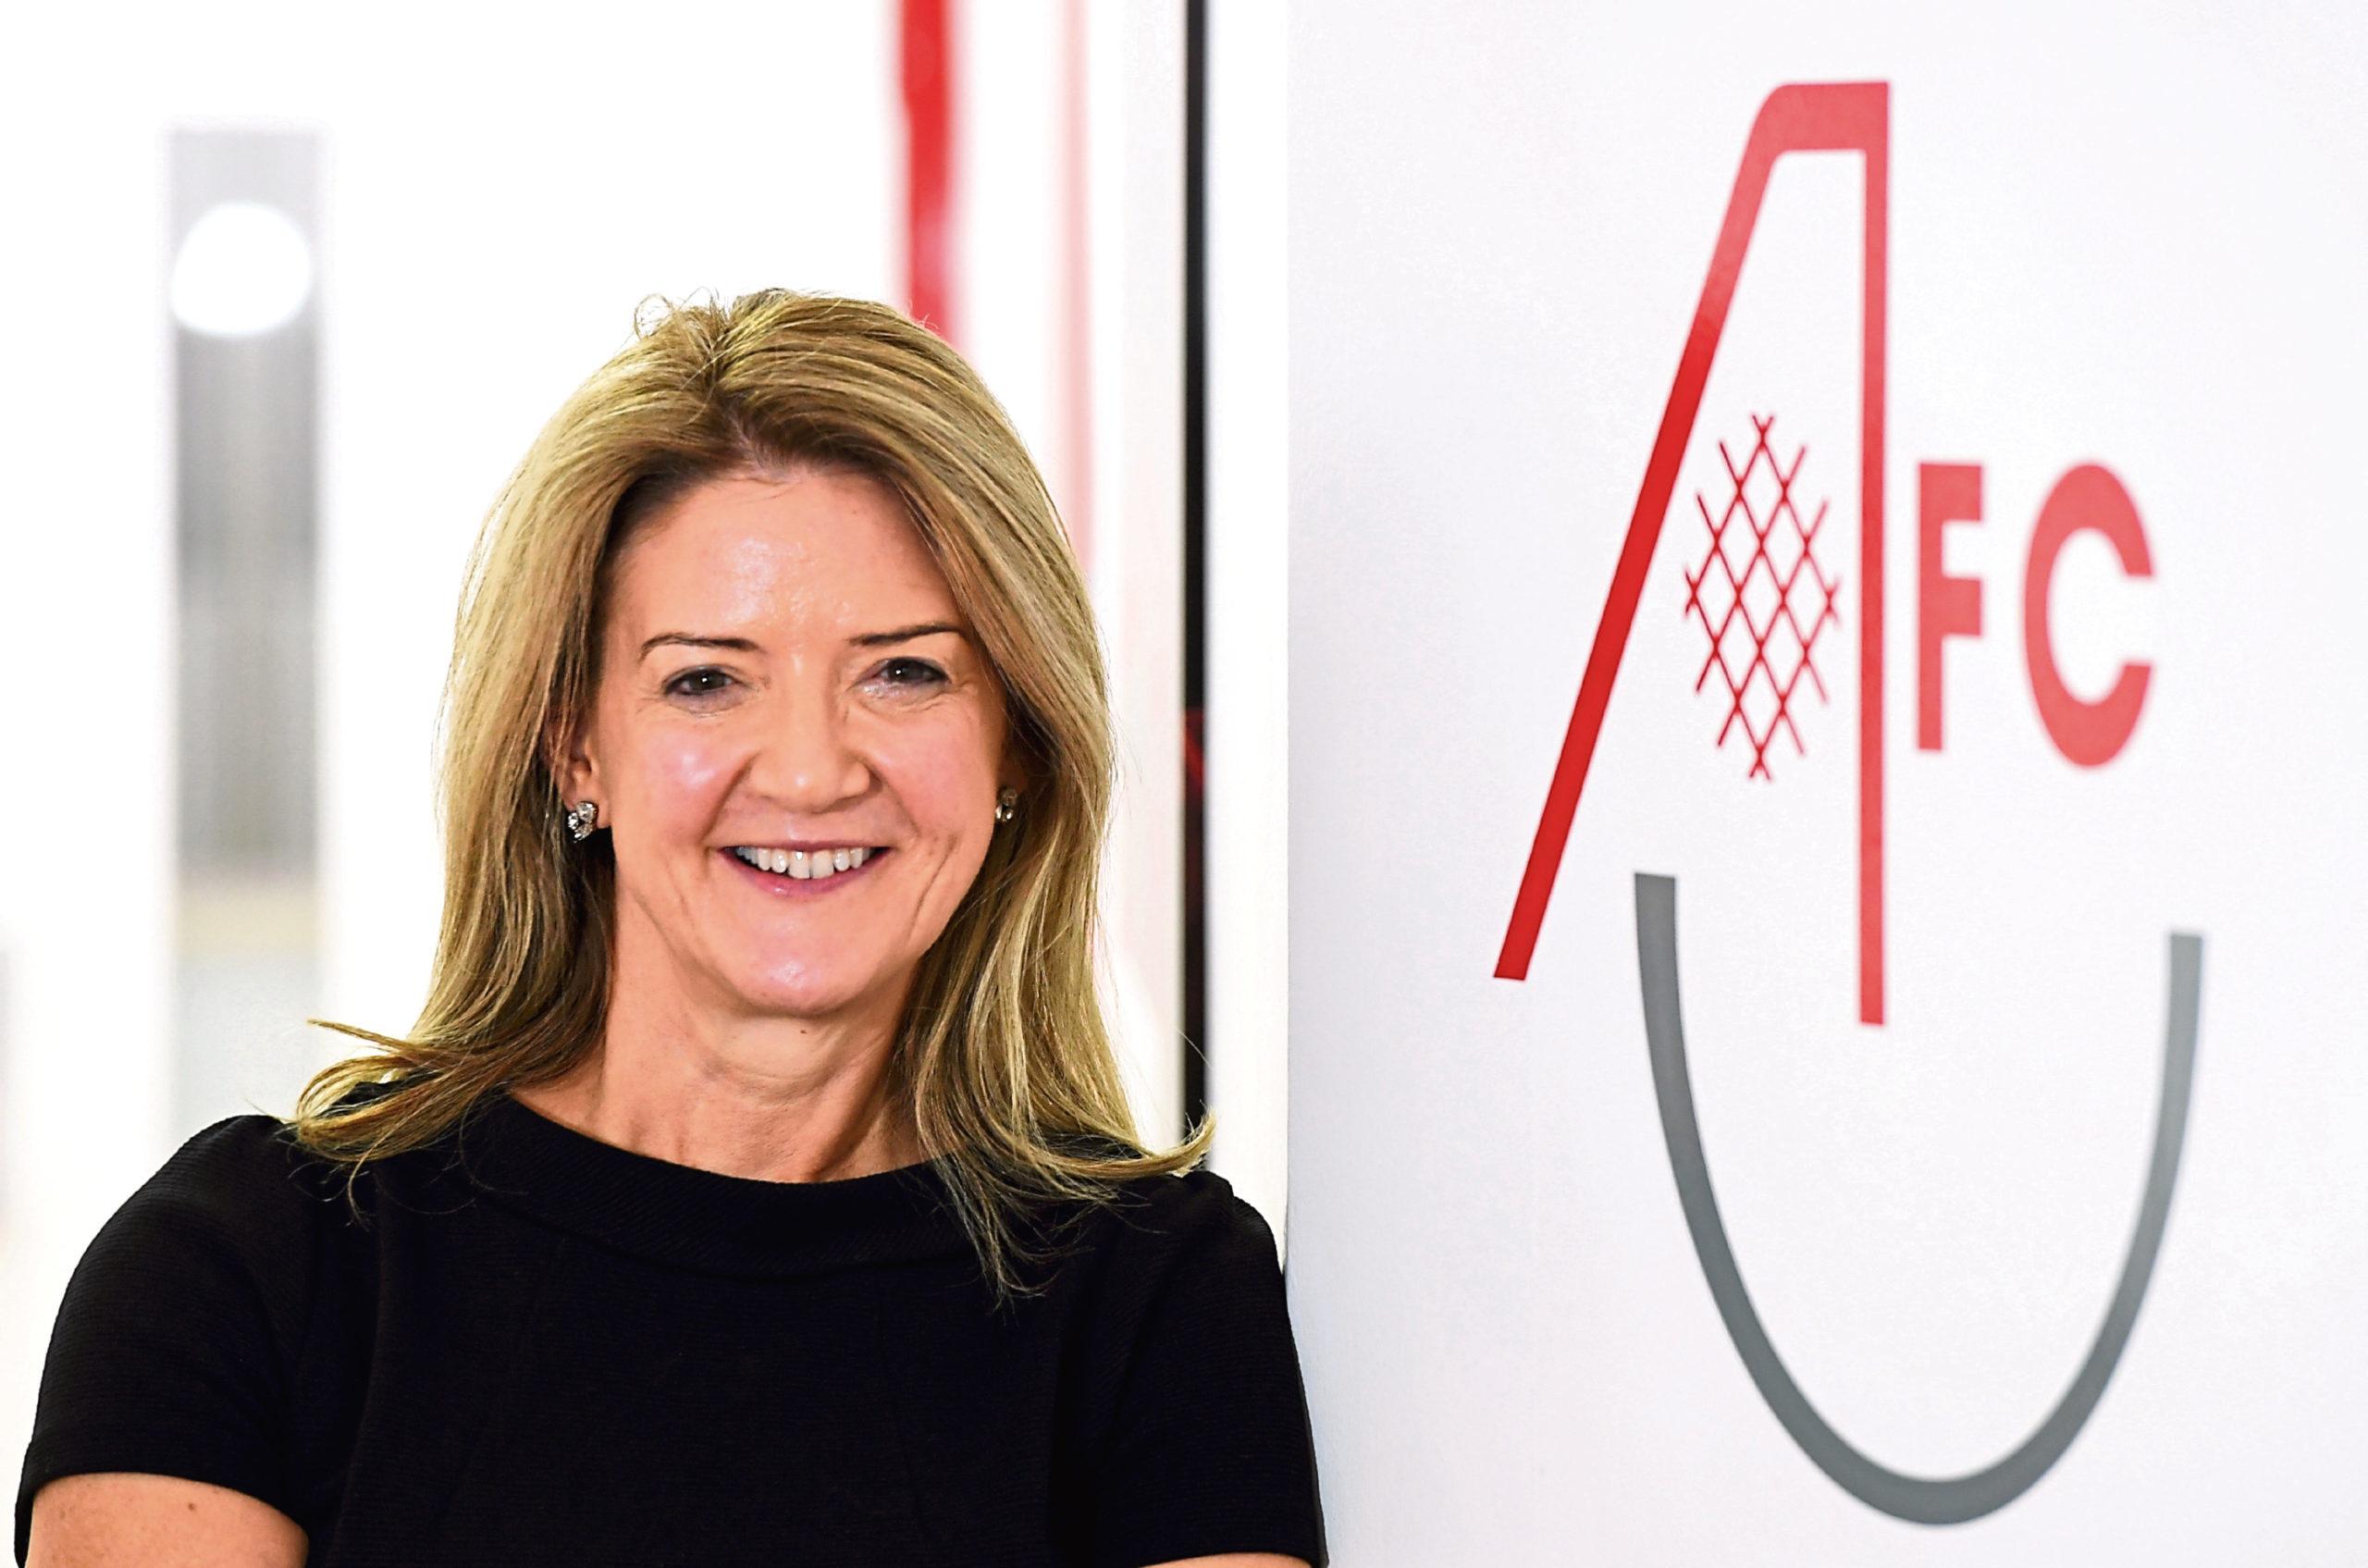 Aberdeen FC Community Trust chief executive Liz Bowie